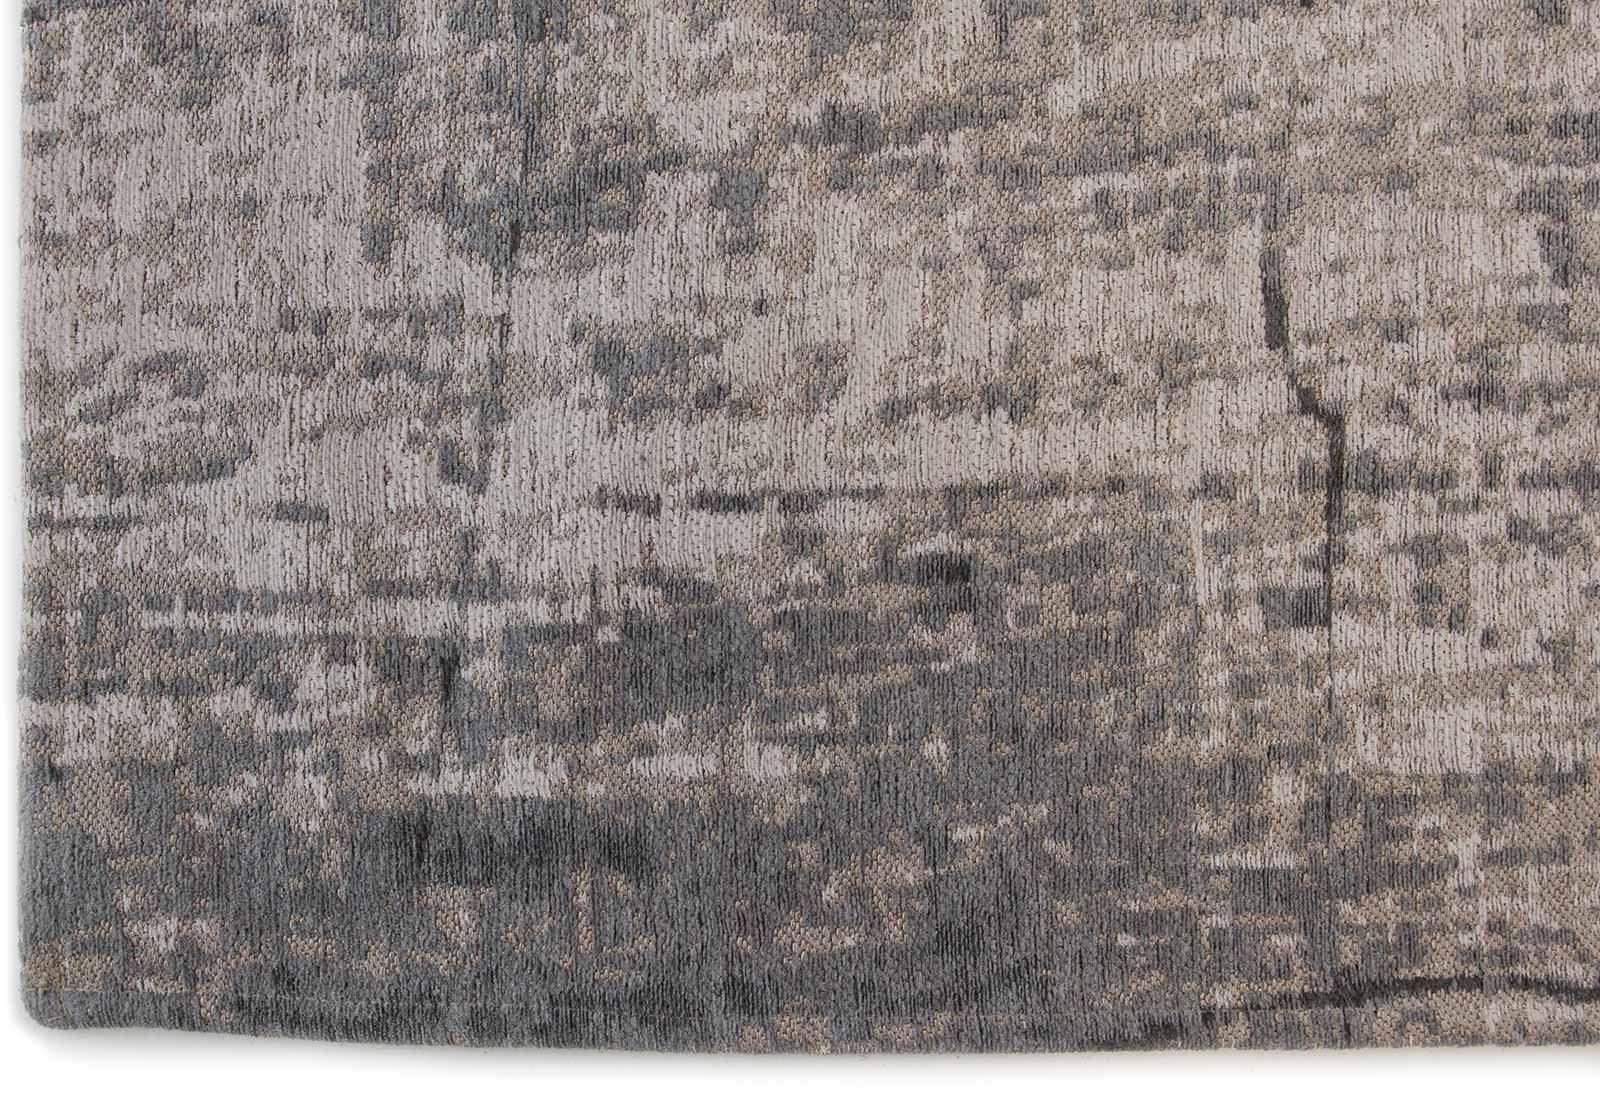 rugs Louis De Poortere LX8420 Mad Men Griff Jersey Stone corner